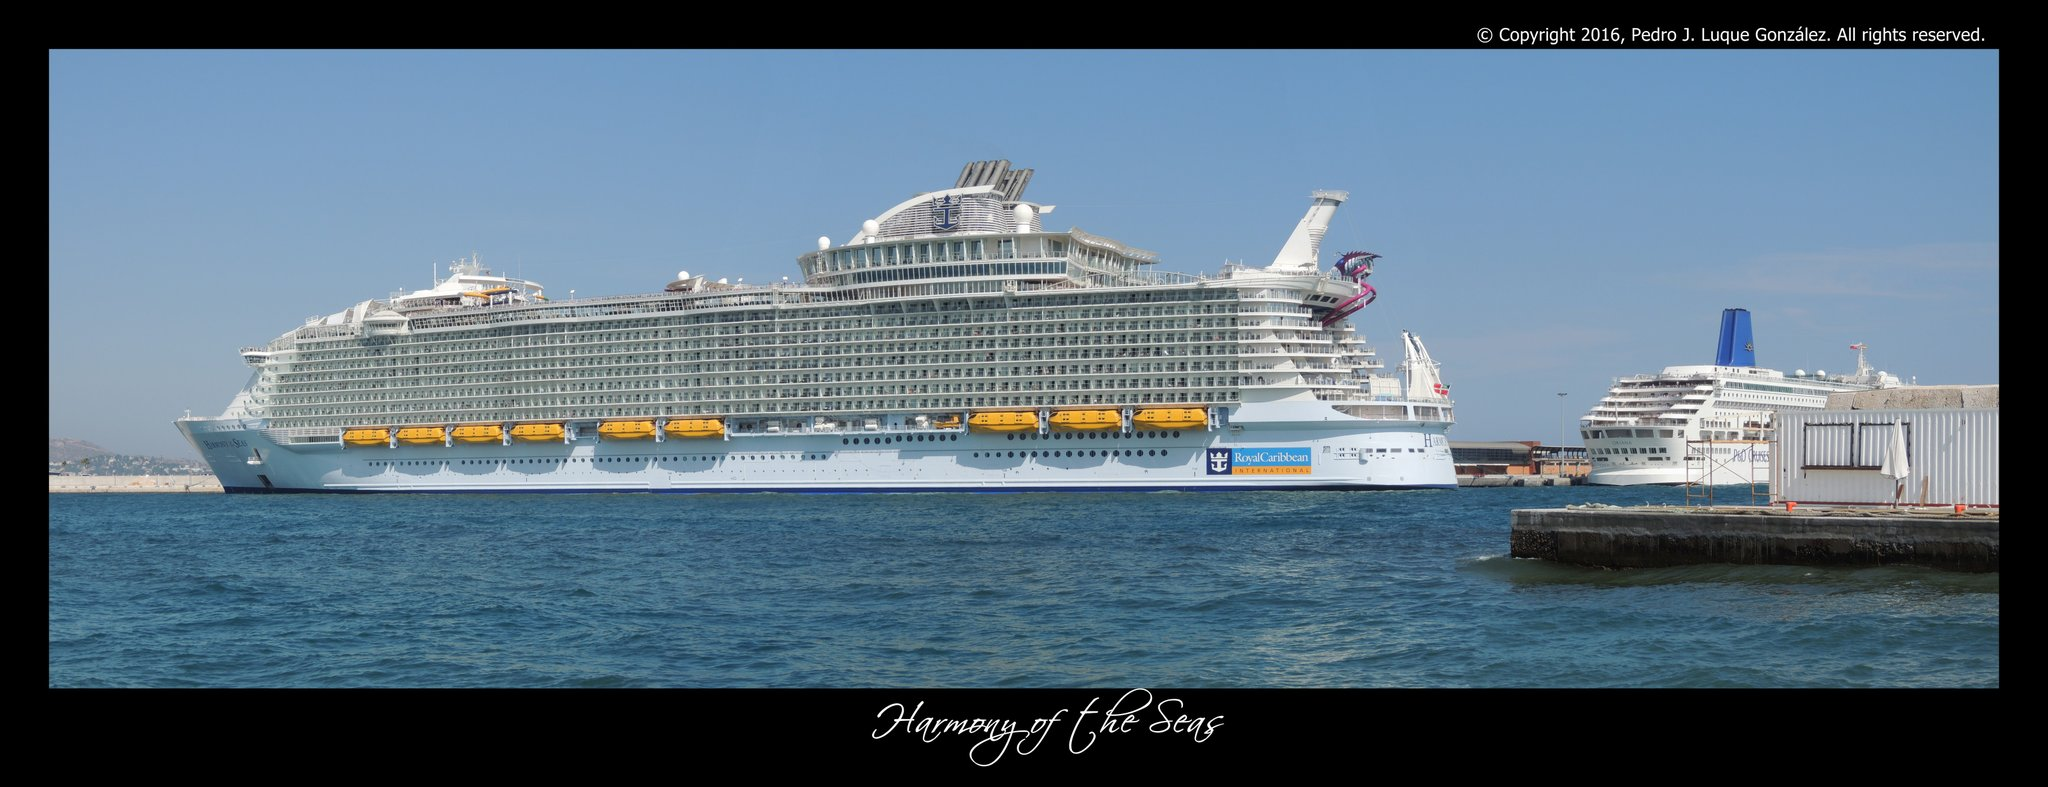 #RoyalCaribbean @DiarioSUR @opiniondemalaga  . El #HarmonyoftheSeas en la terminal de cruceros de #Malaga. https://t.co/LVytV6f75G